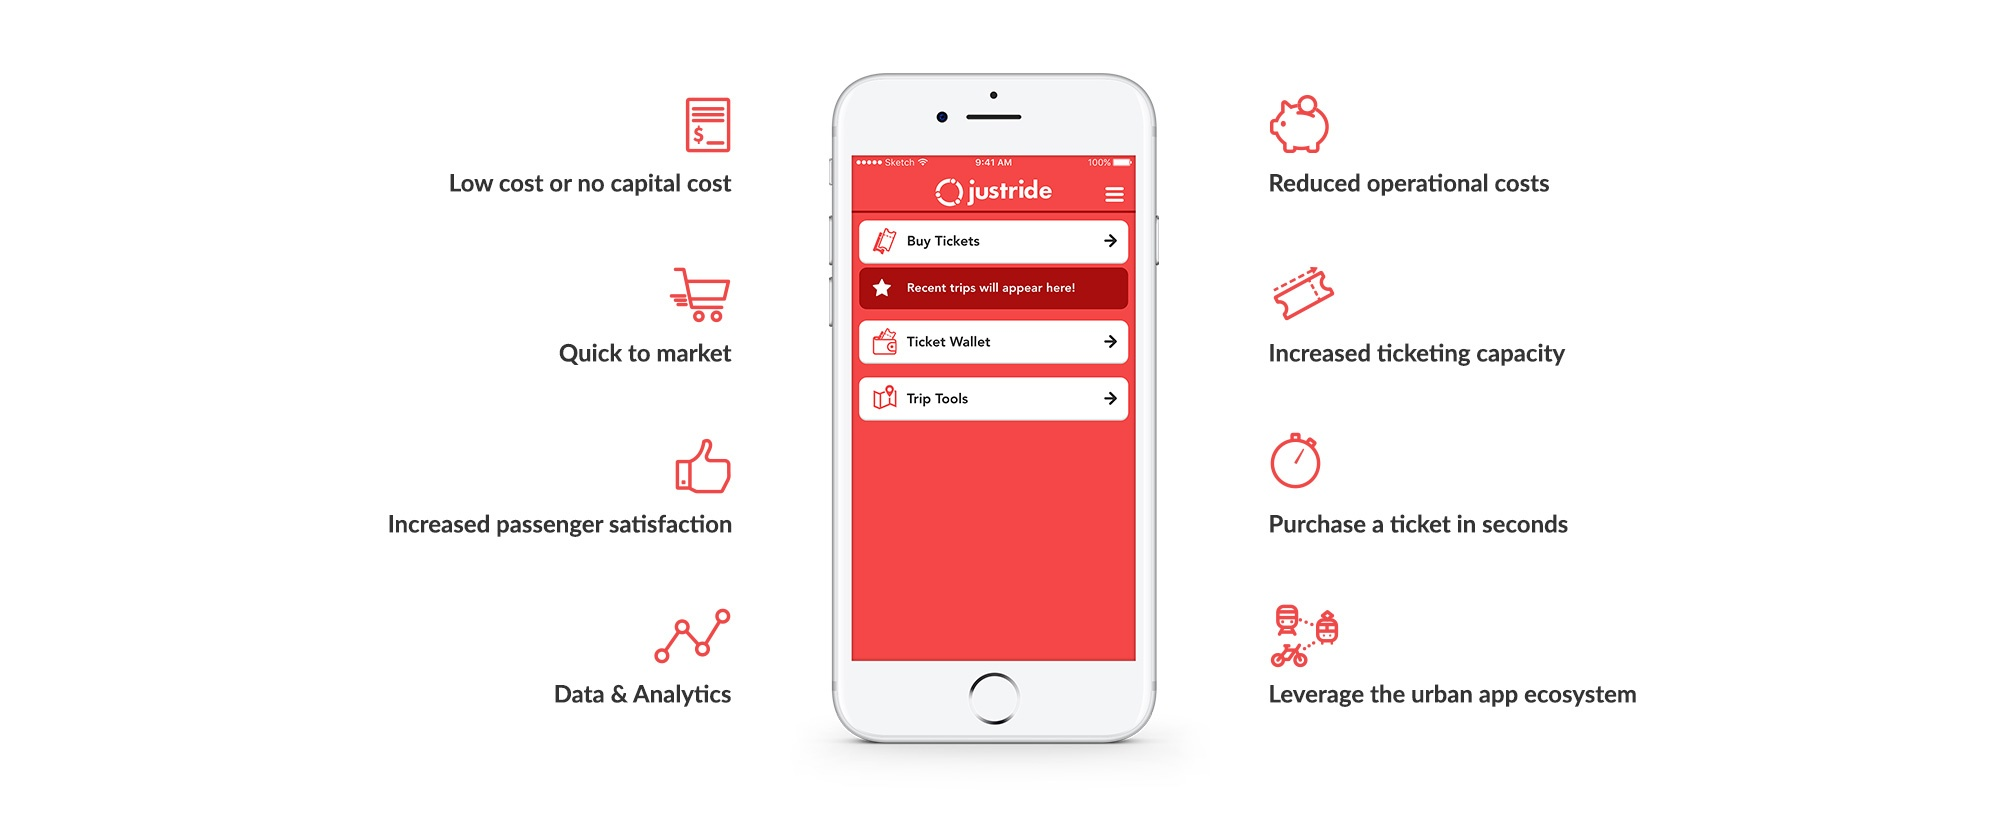 justride-app-benefits.jpg